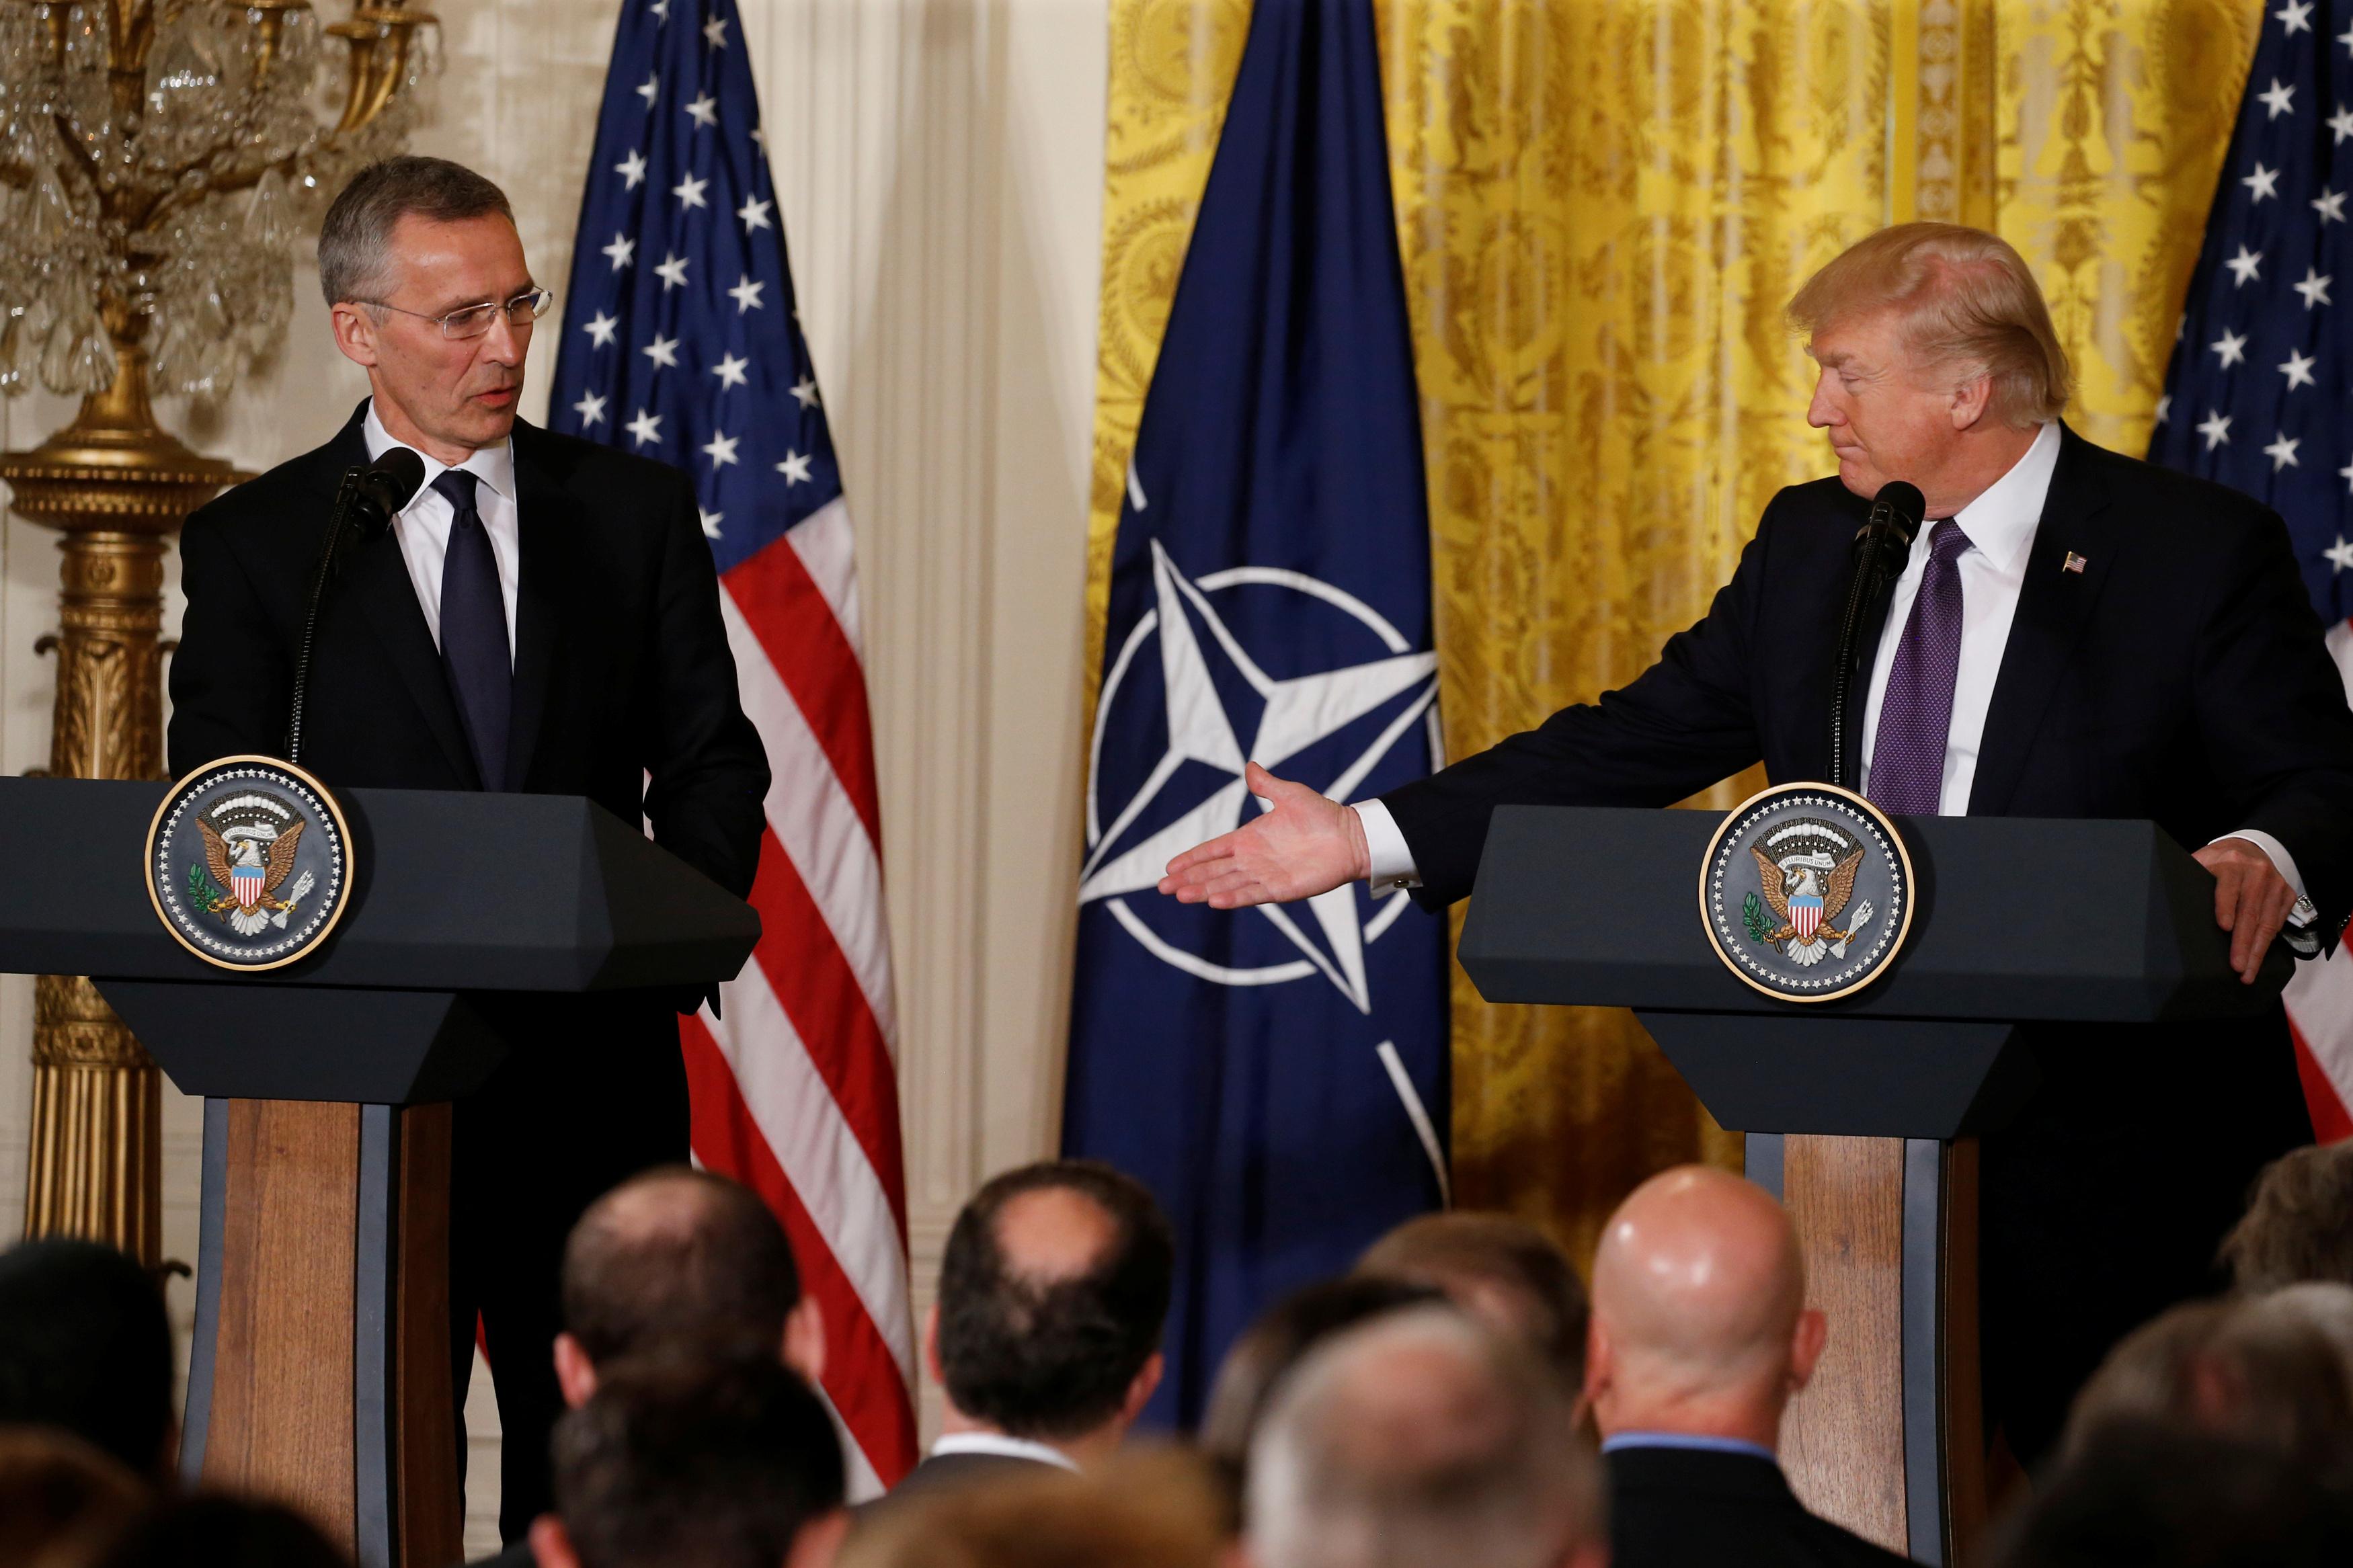 U.S. President Donald Trump (R) and NATO Secretary General Jens Stoltenberg